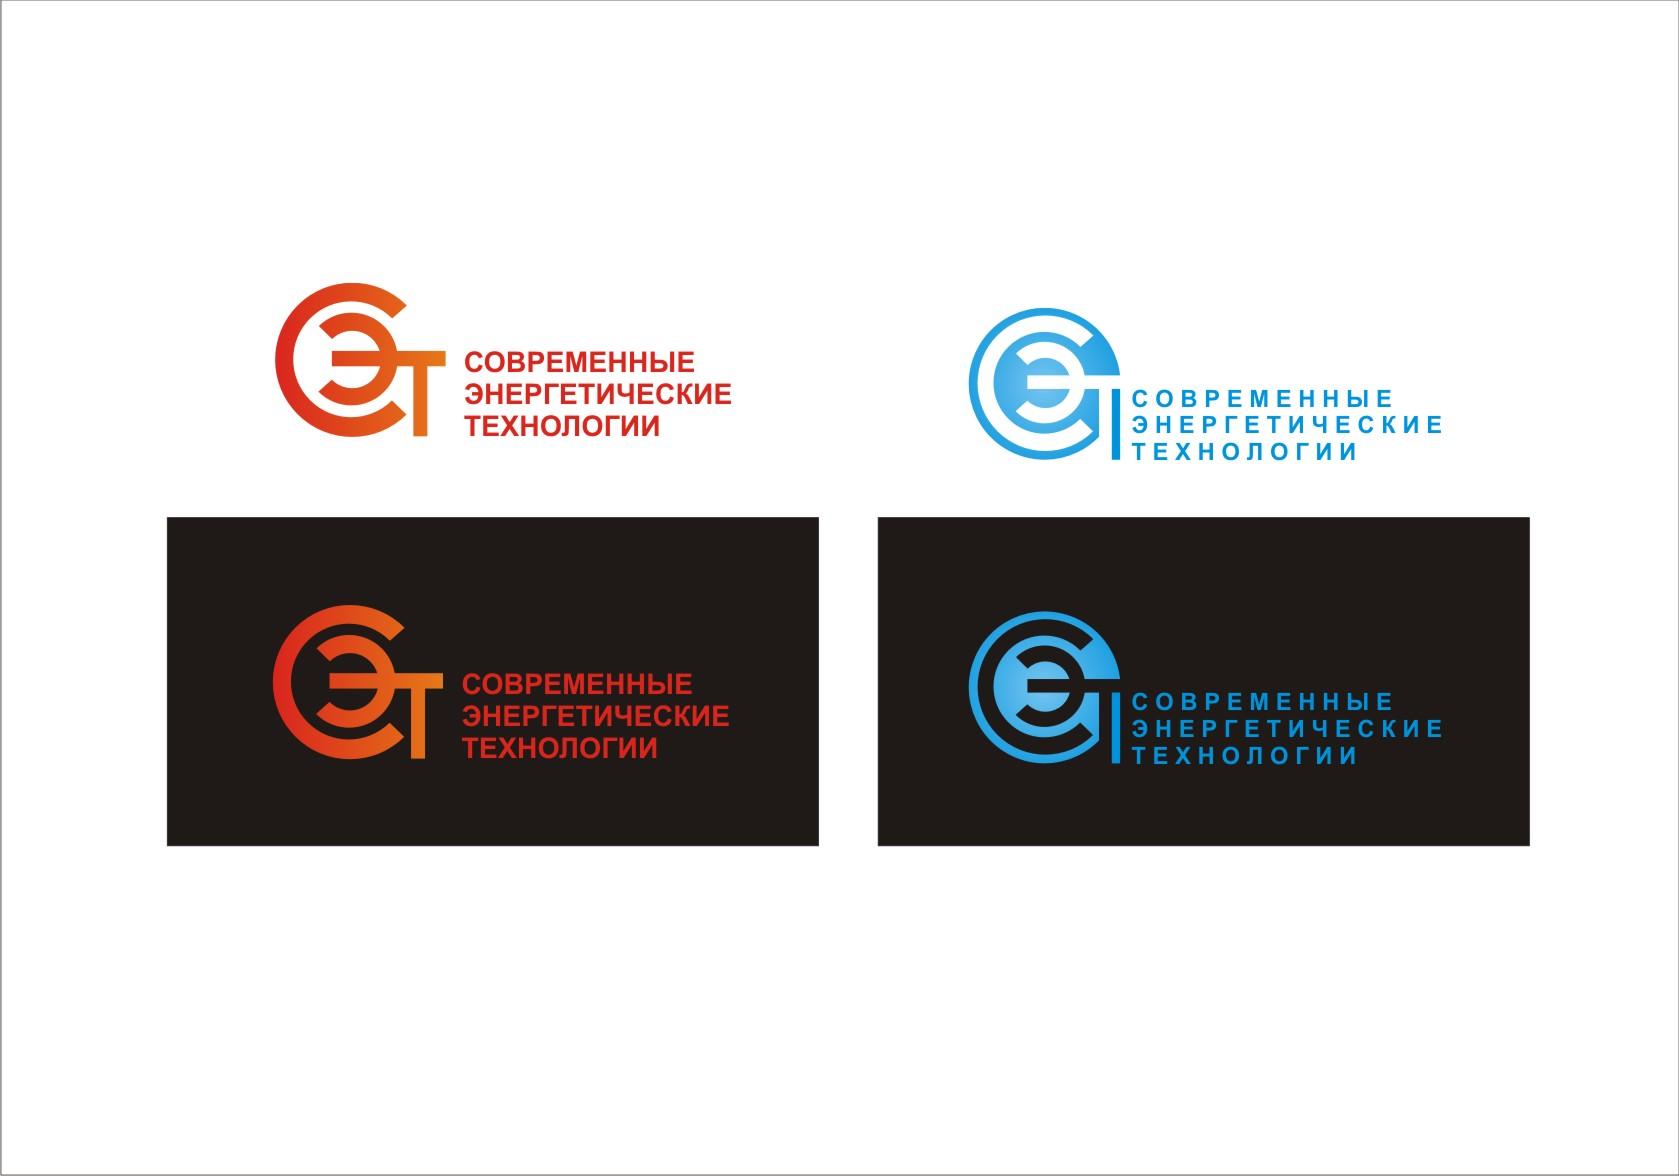 Срочно! Дизайн логотипа ООО «СЭТ» фото f_3845d4d7b06a24ce.jpg